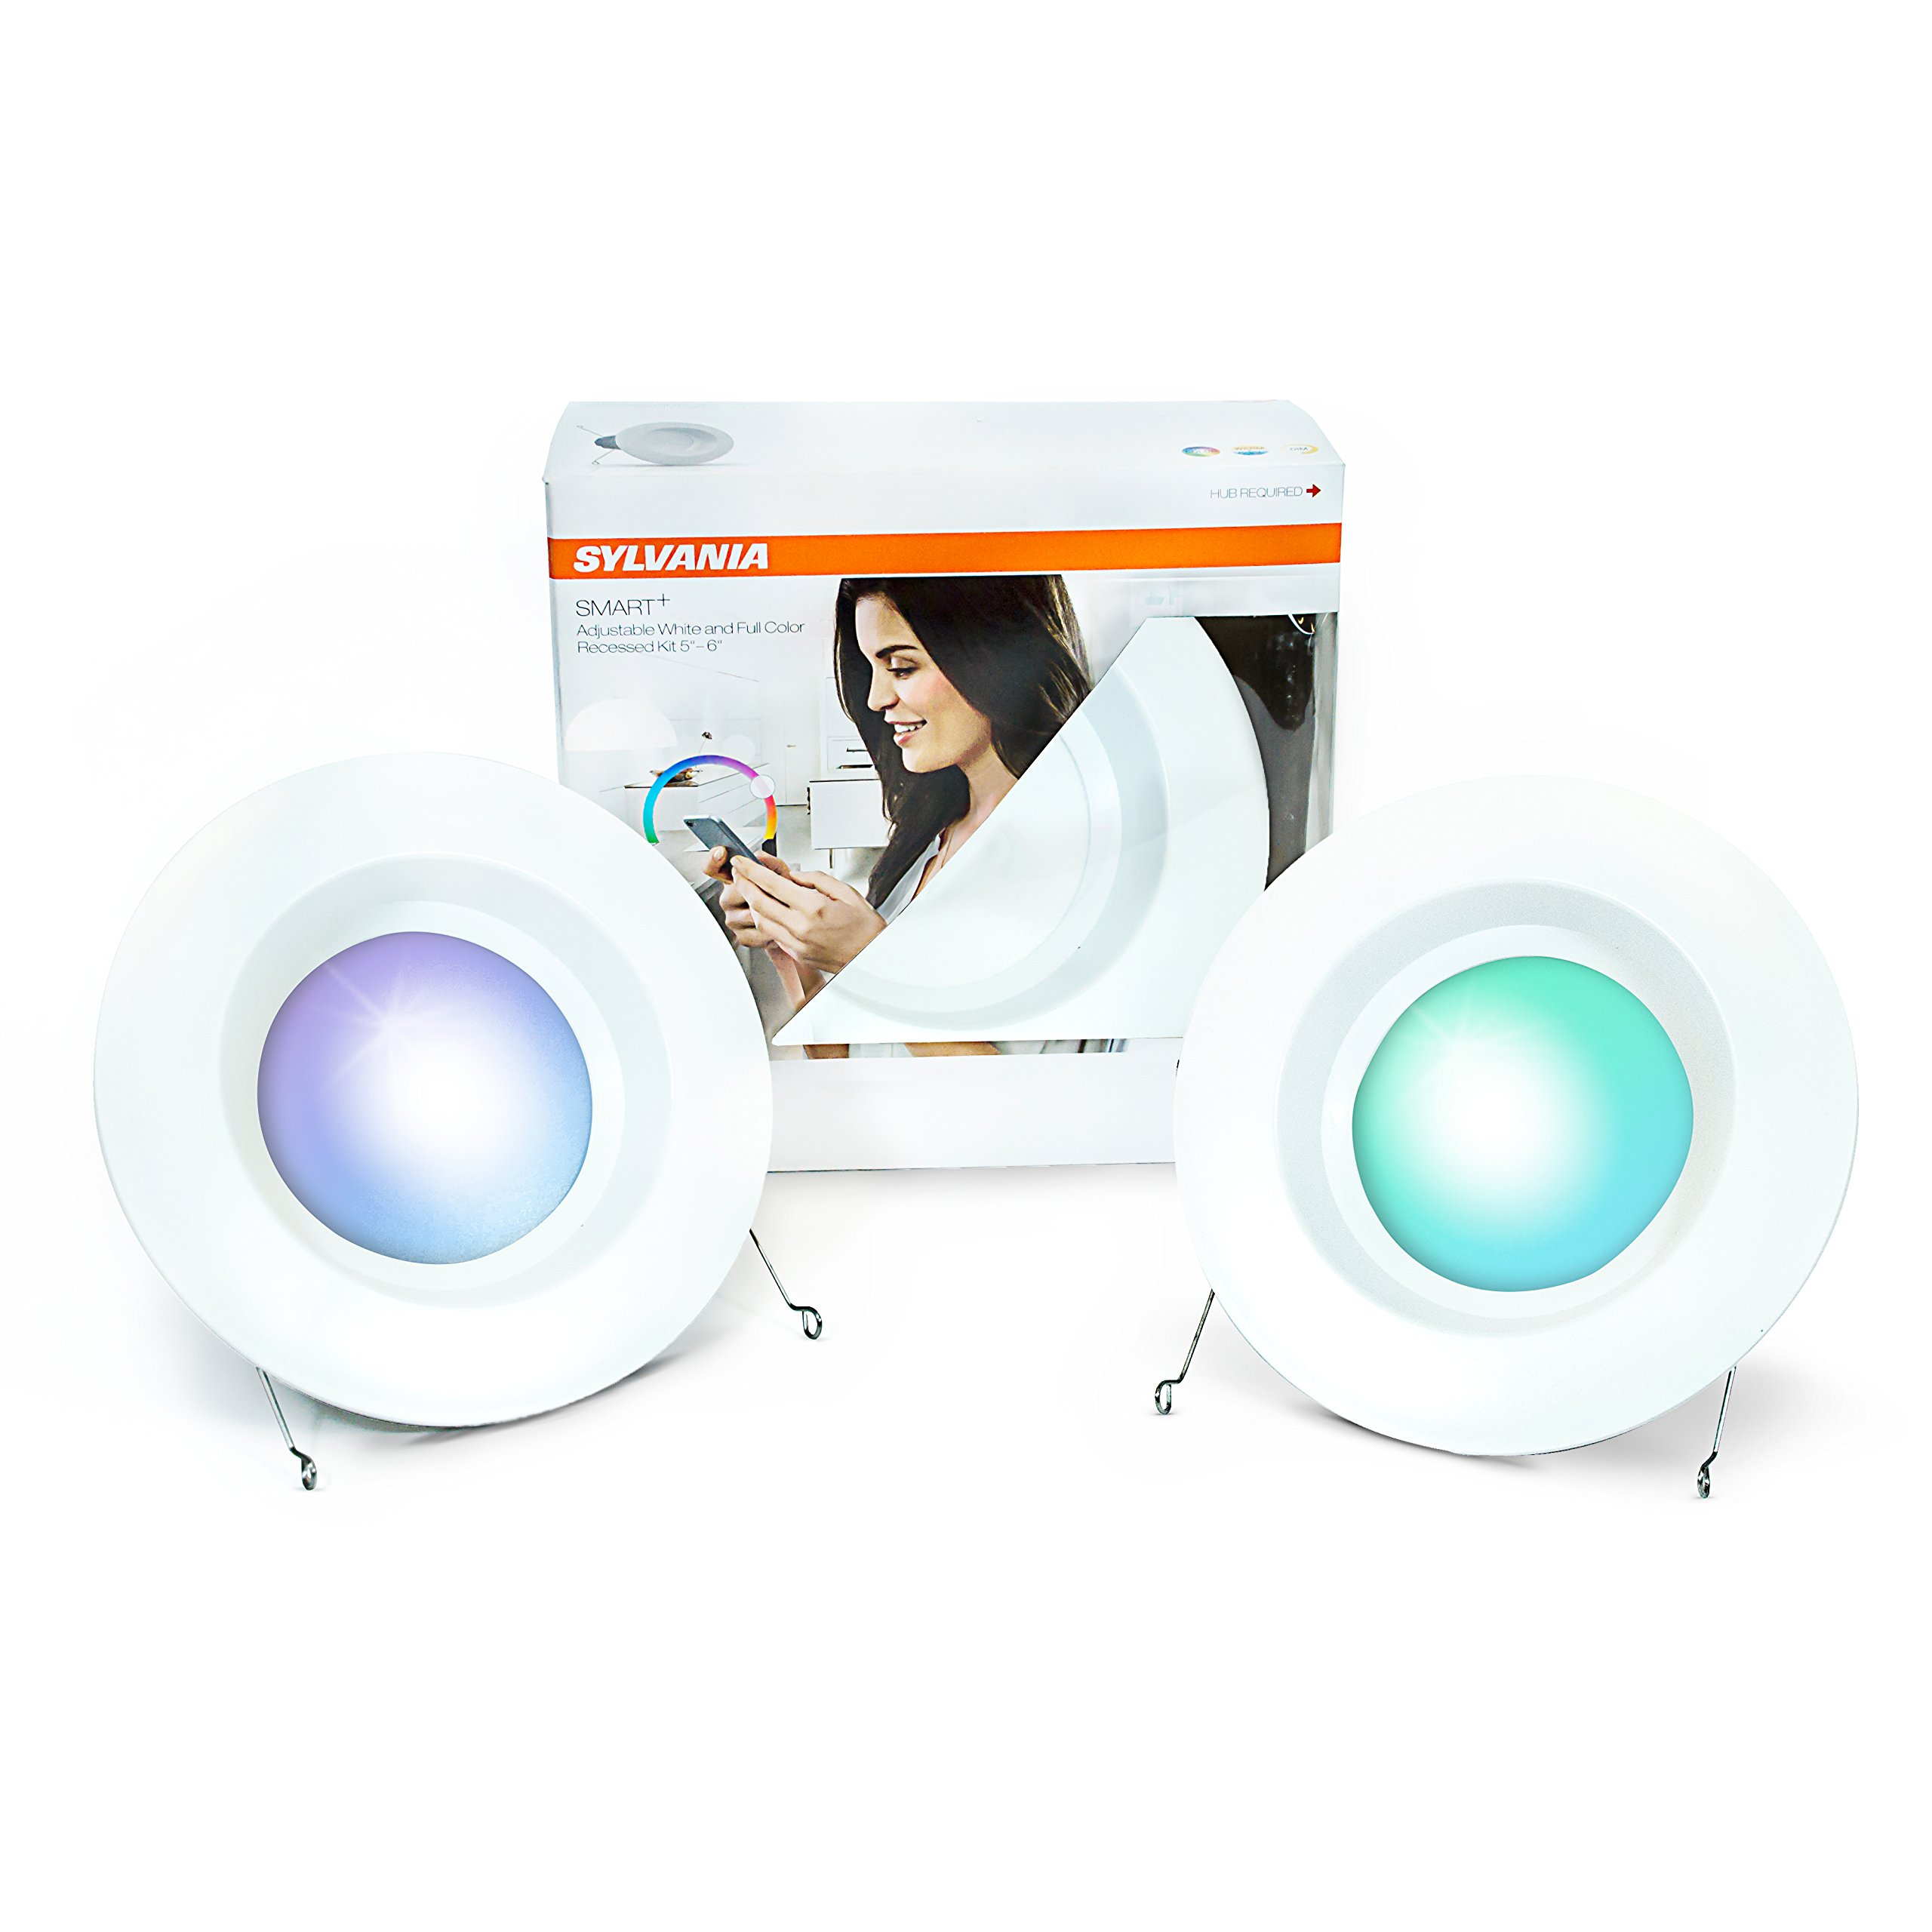 Sylvania Lightify 65W LED Smart Home Color/White Light Bulb (2 Pack)